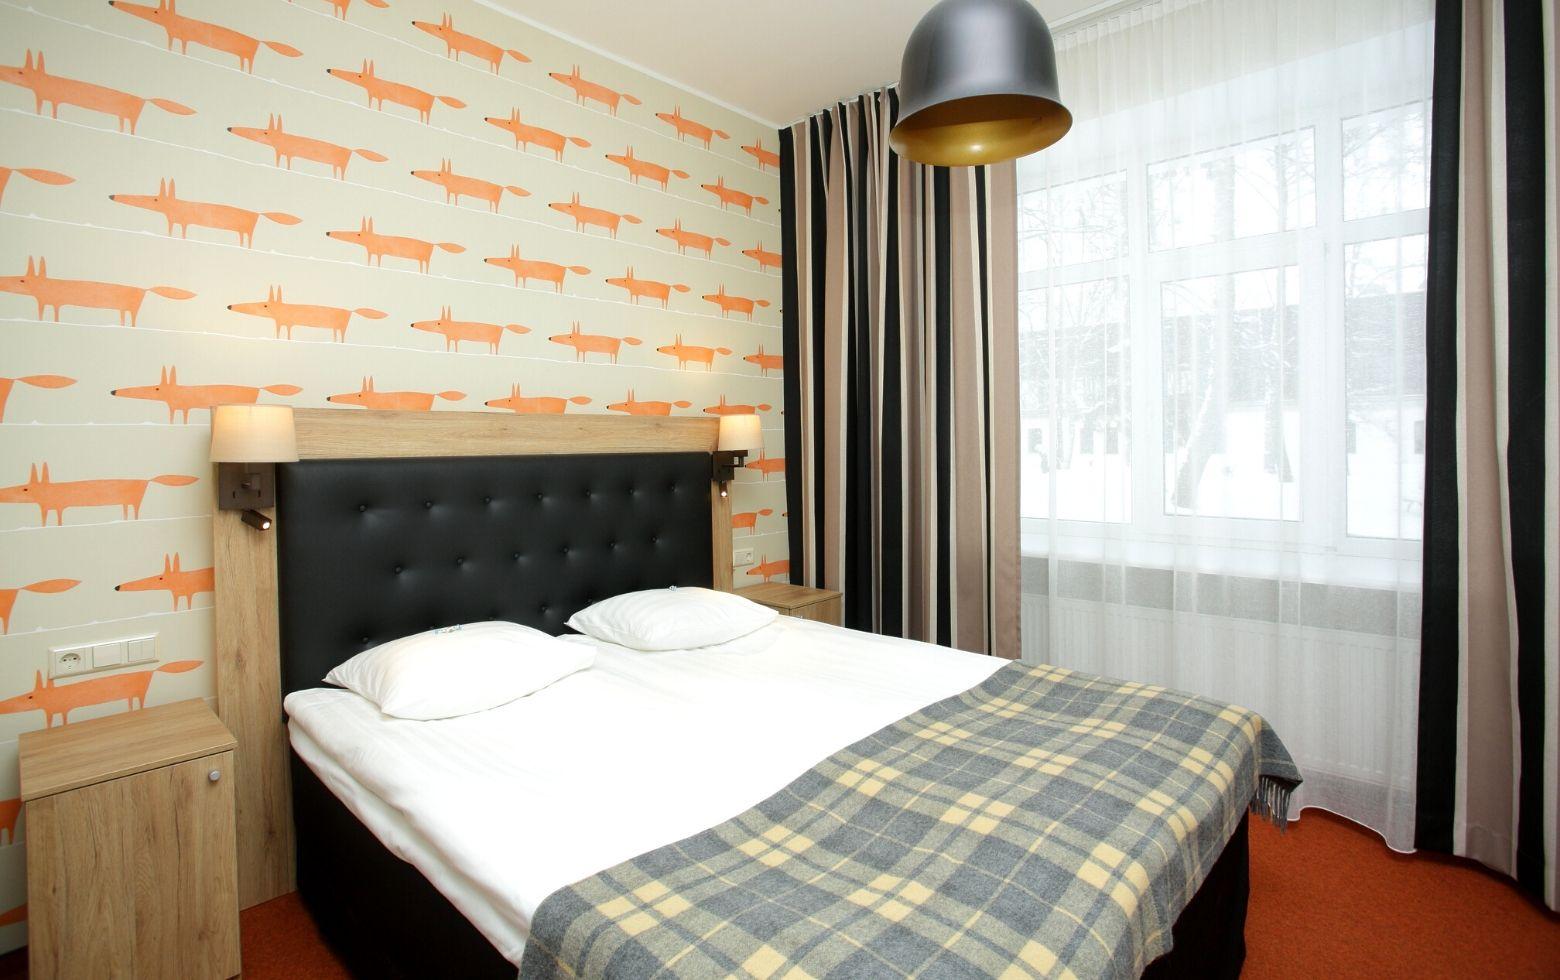 gospa-viesnicas-gal-Puhajarve SPA Hotel6